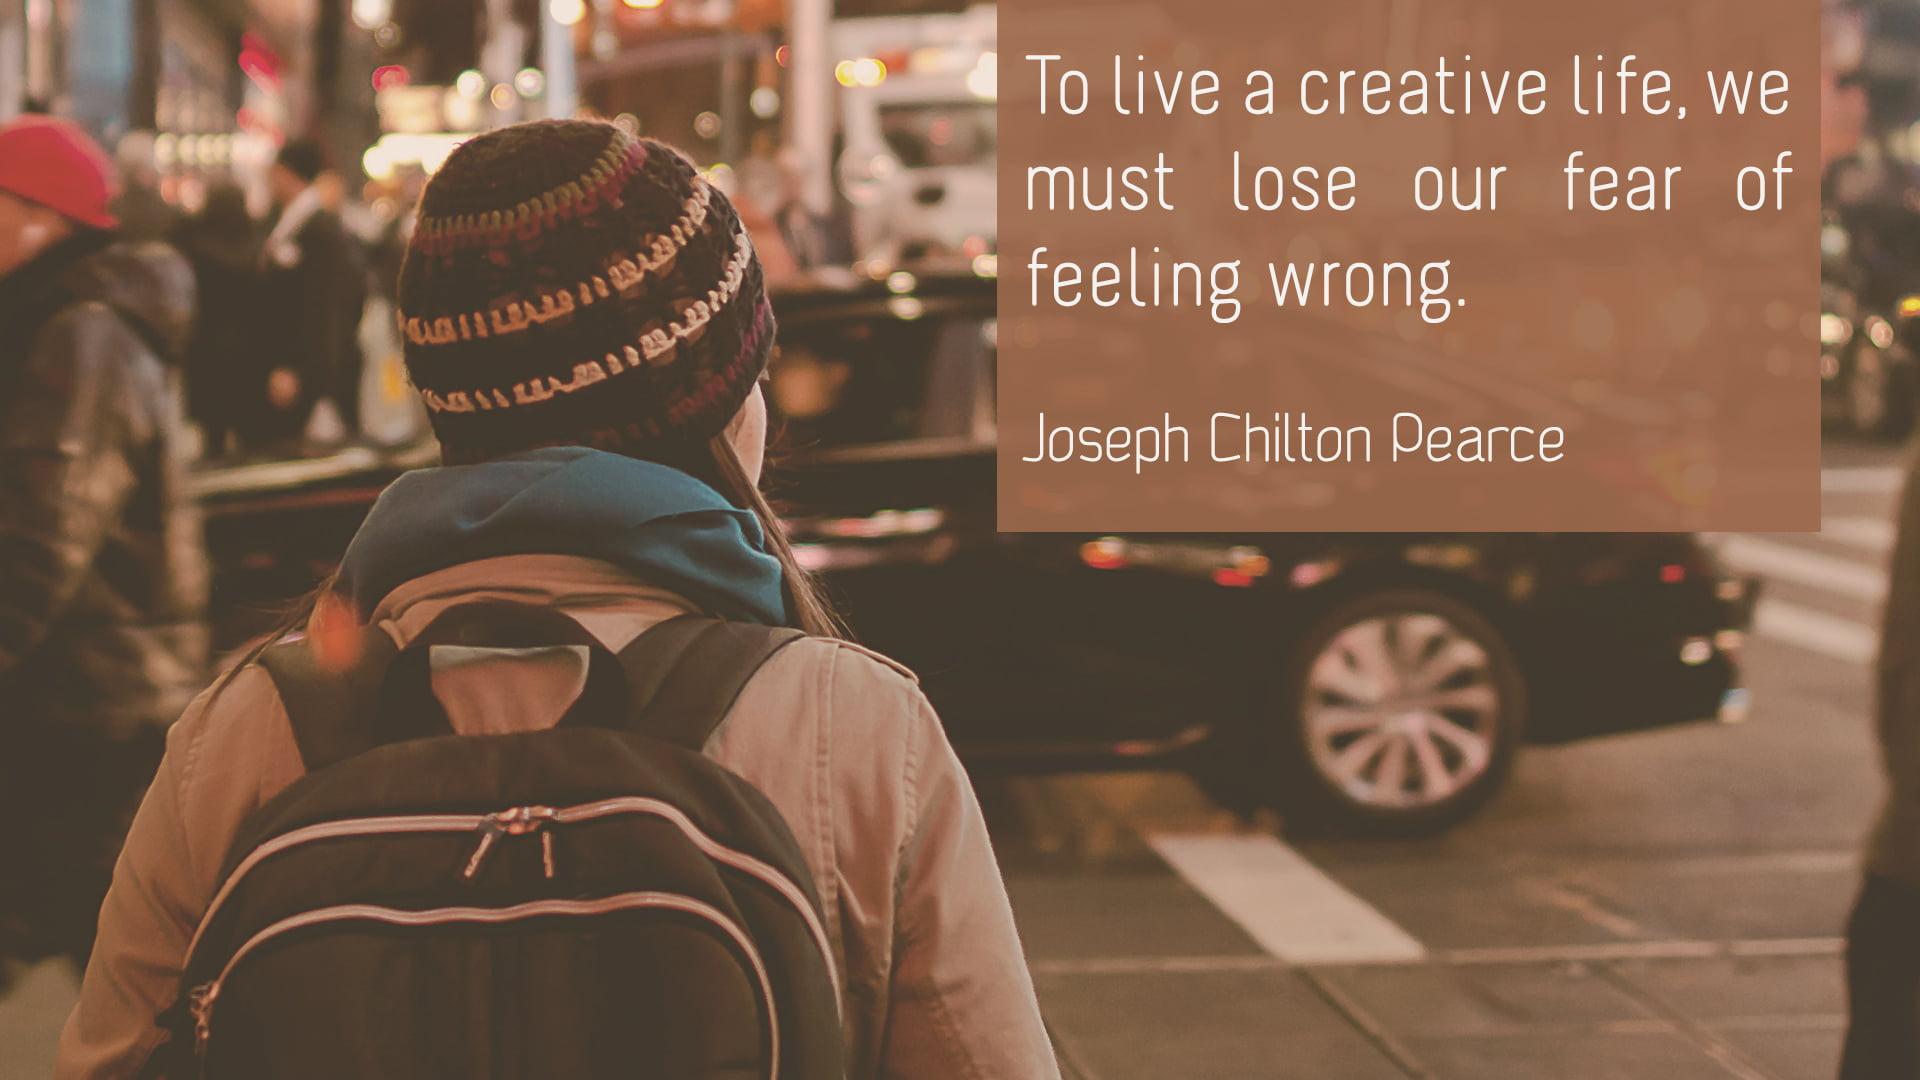 Joseph Chilton Pearce – A creative life